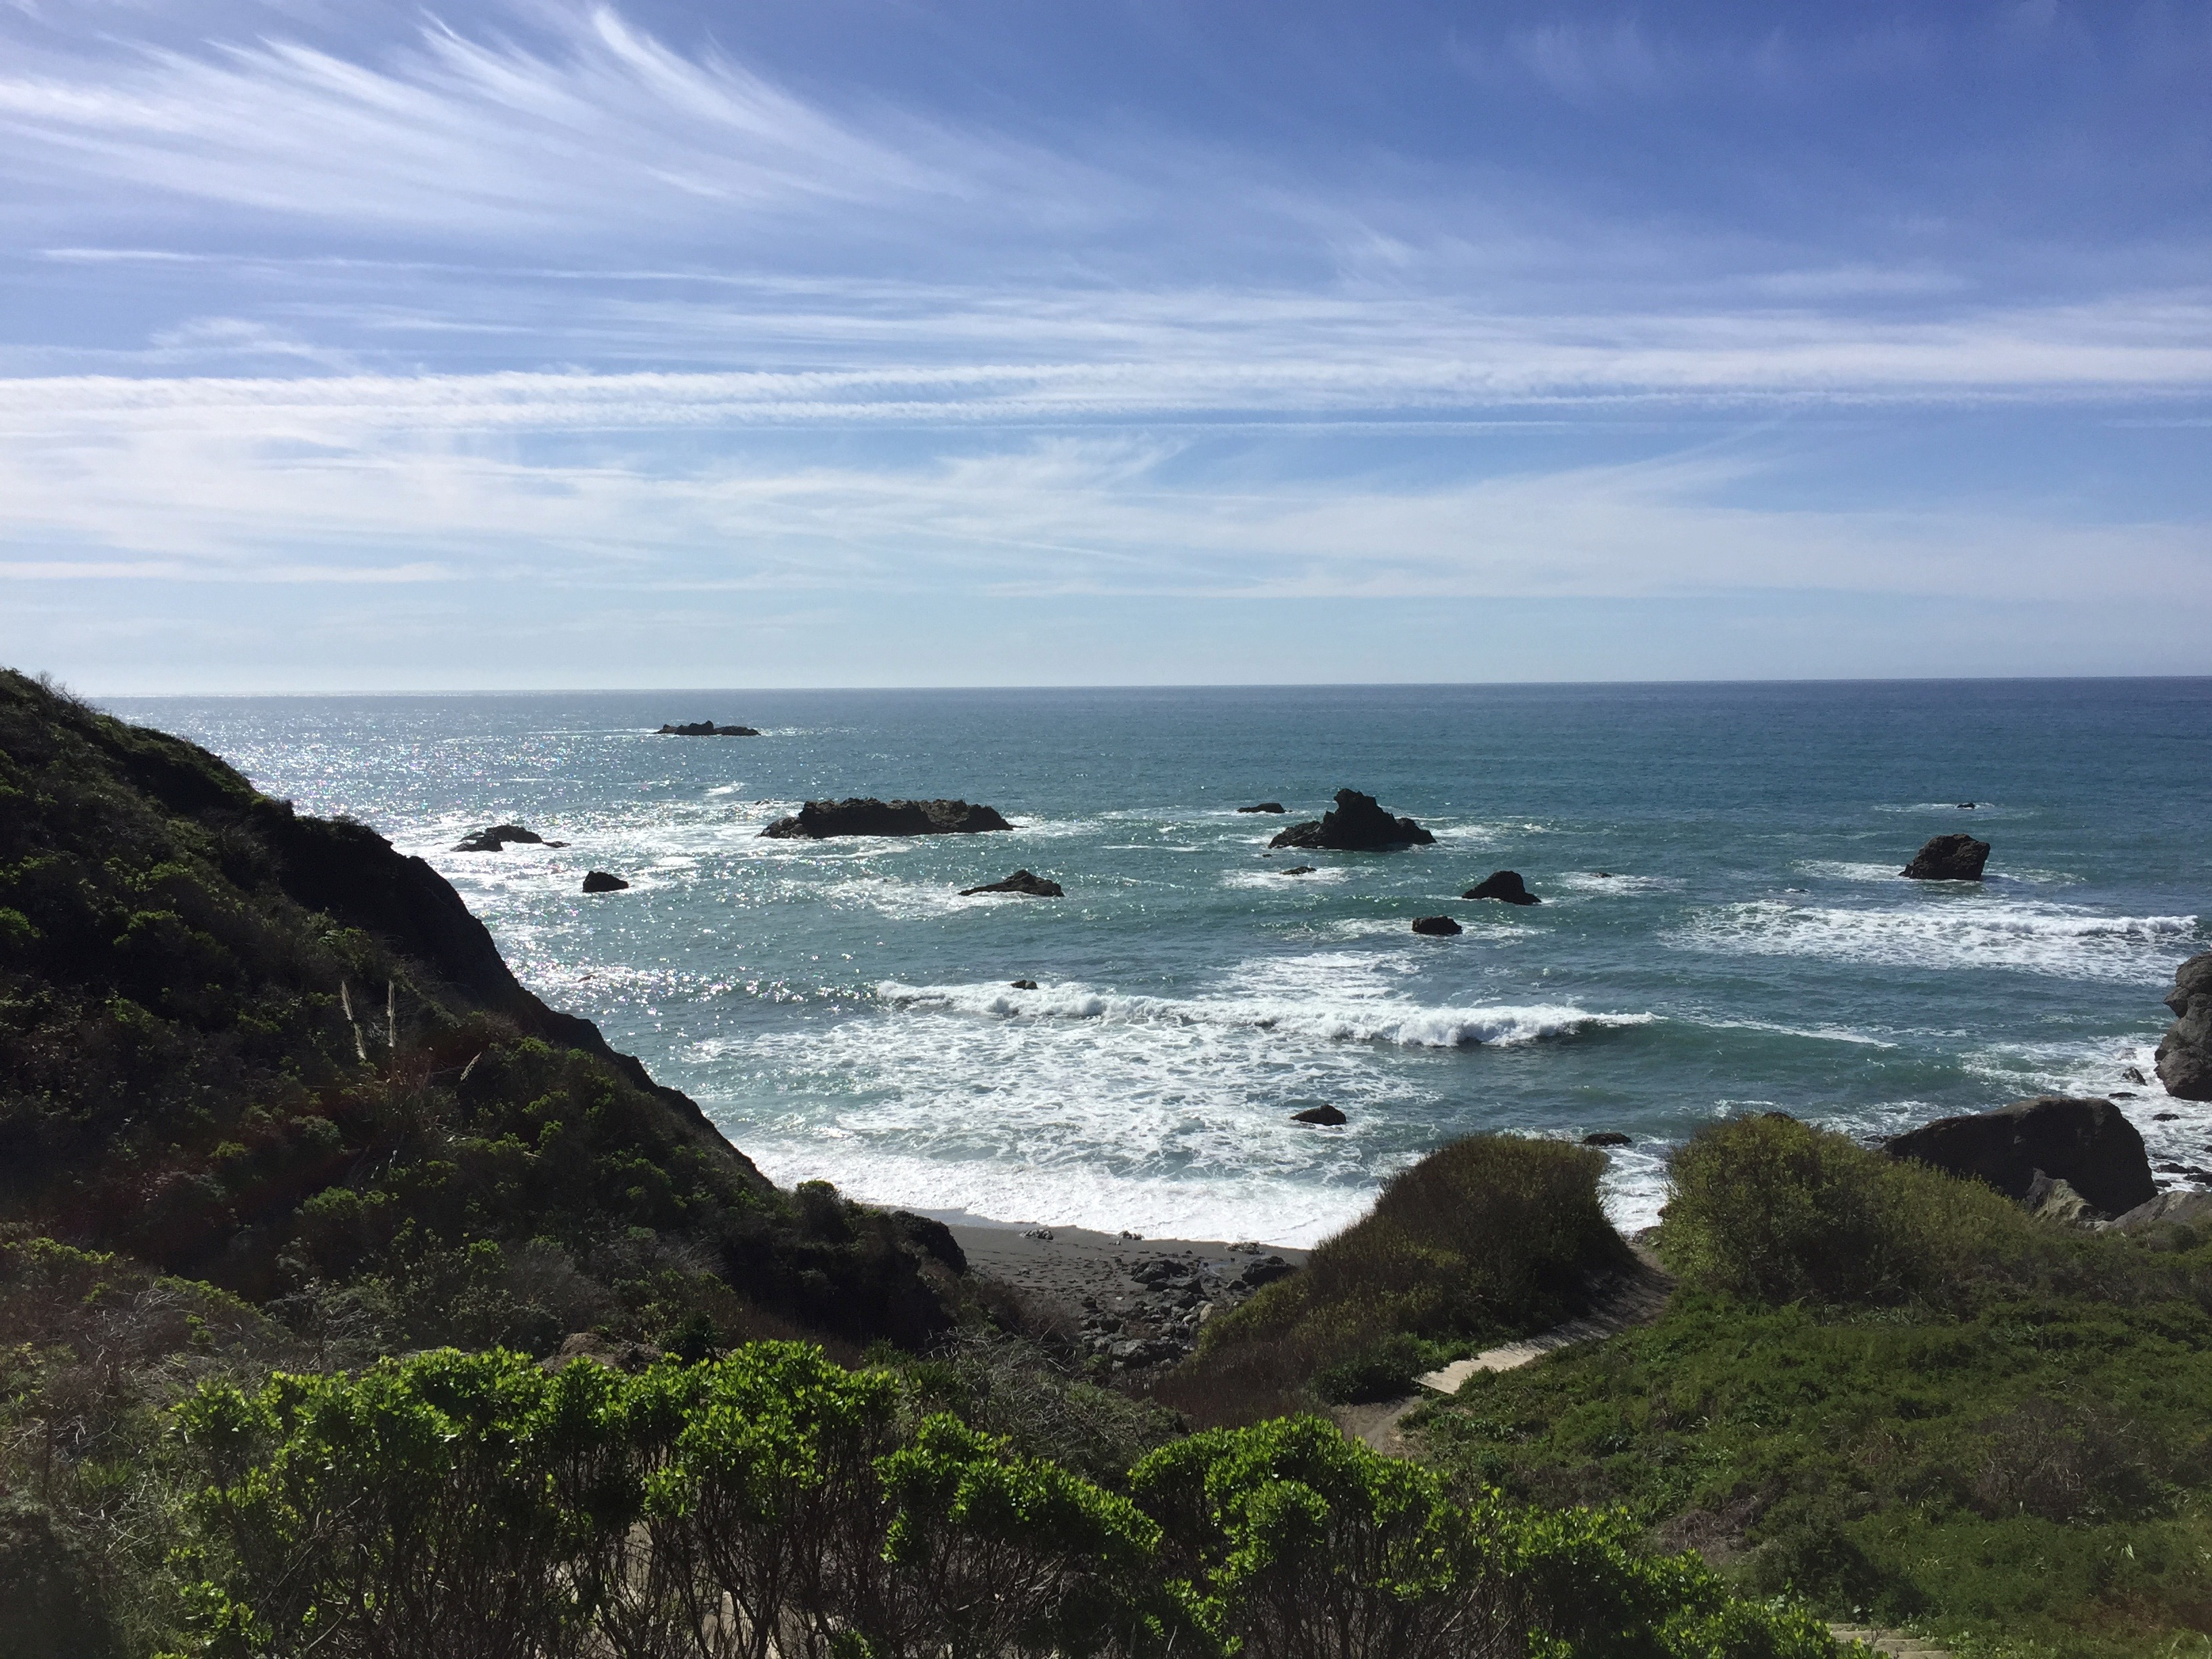 Shell Beach Sonoma County California